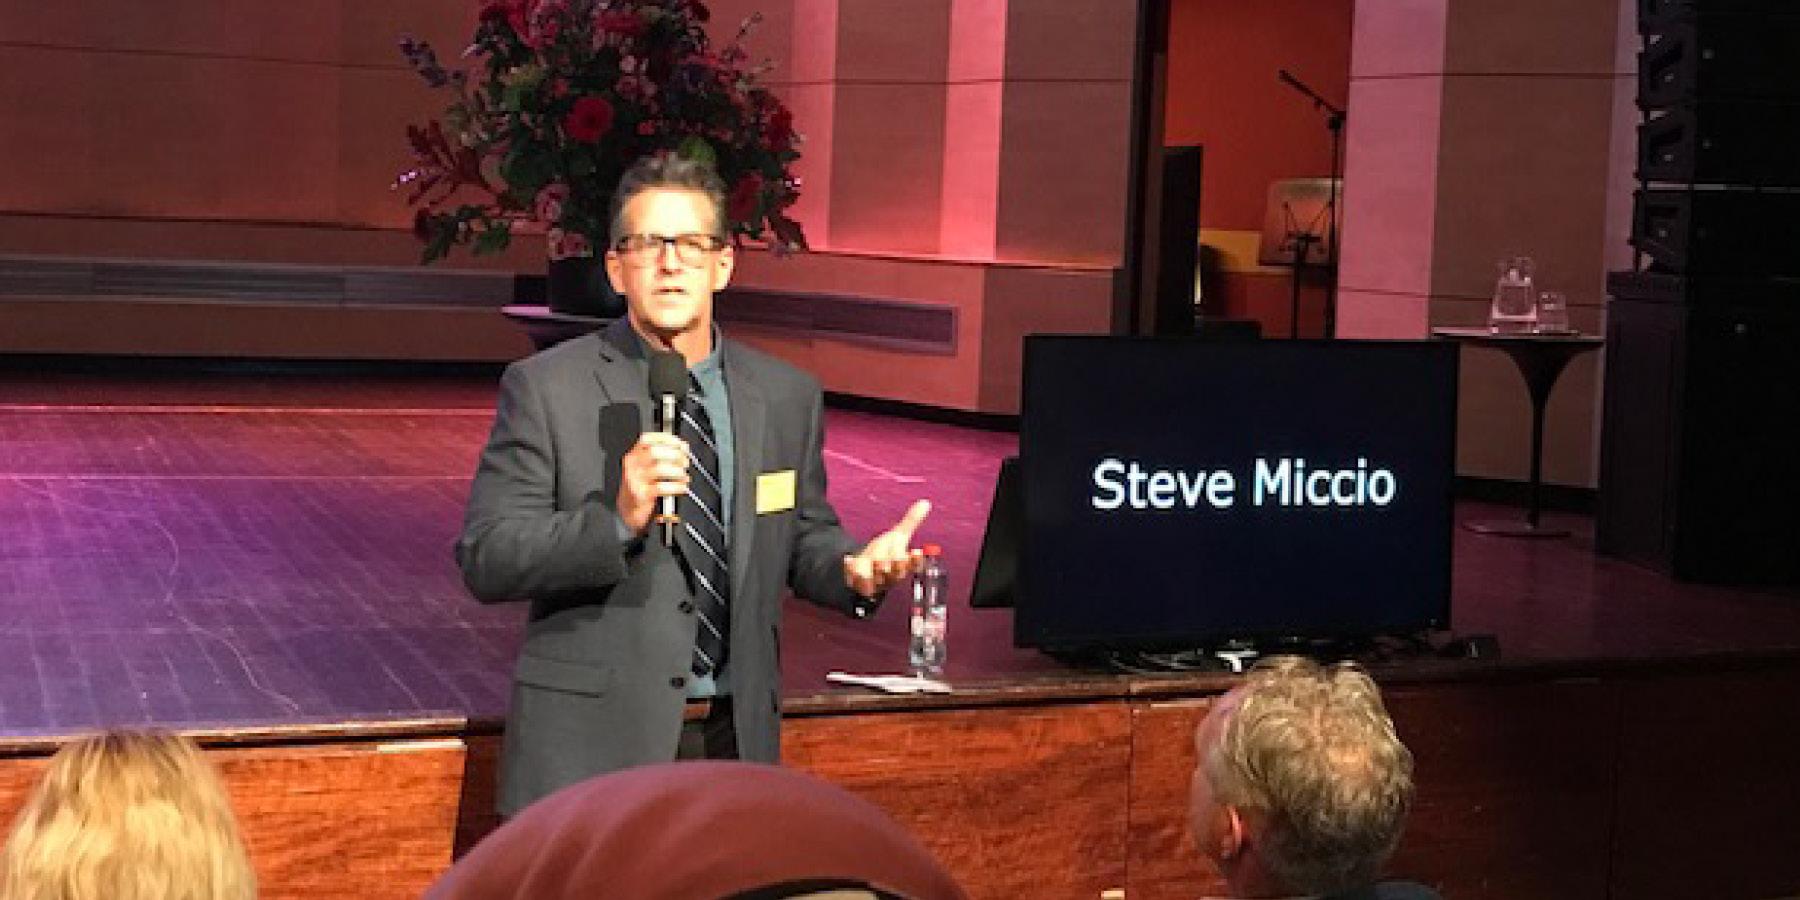 Steve Miccio making presentation